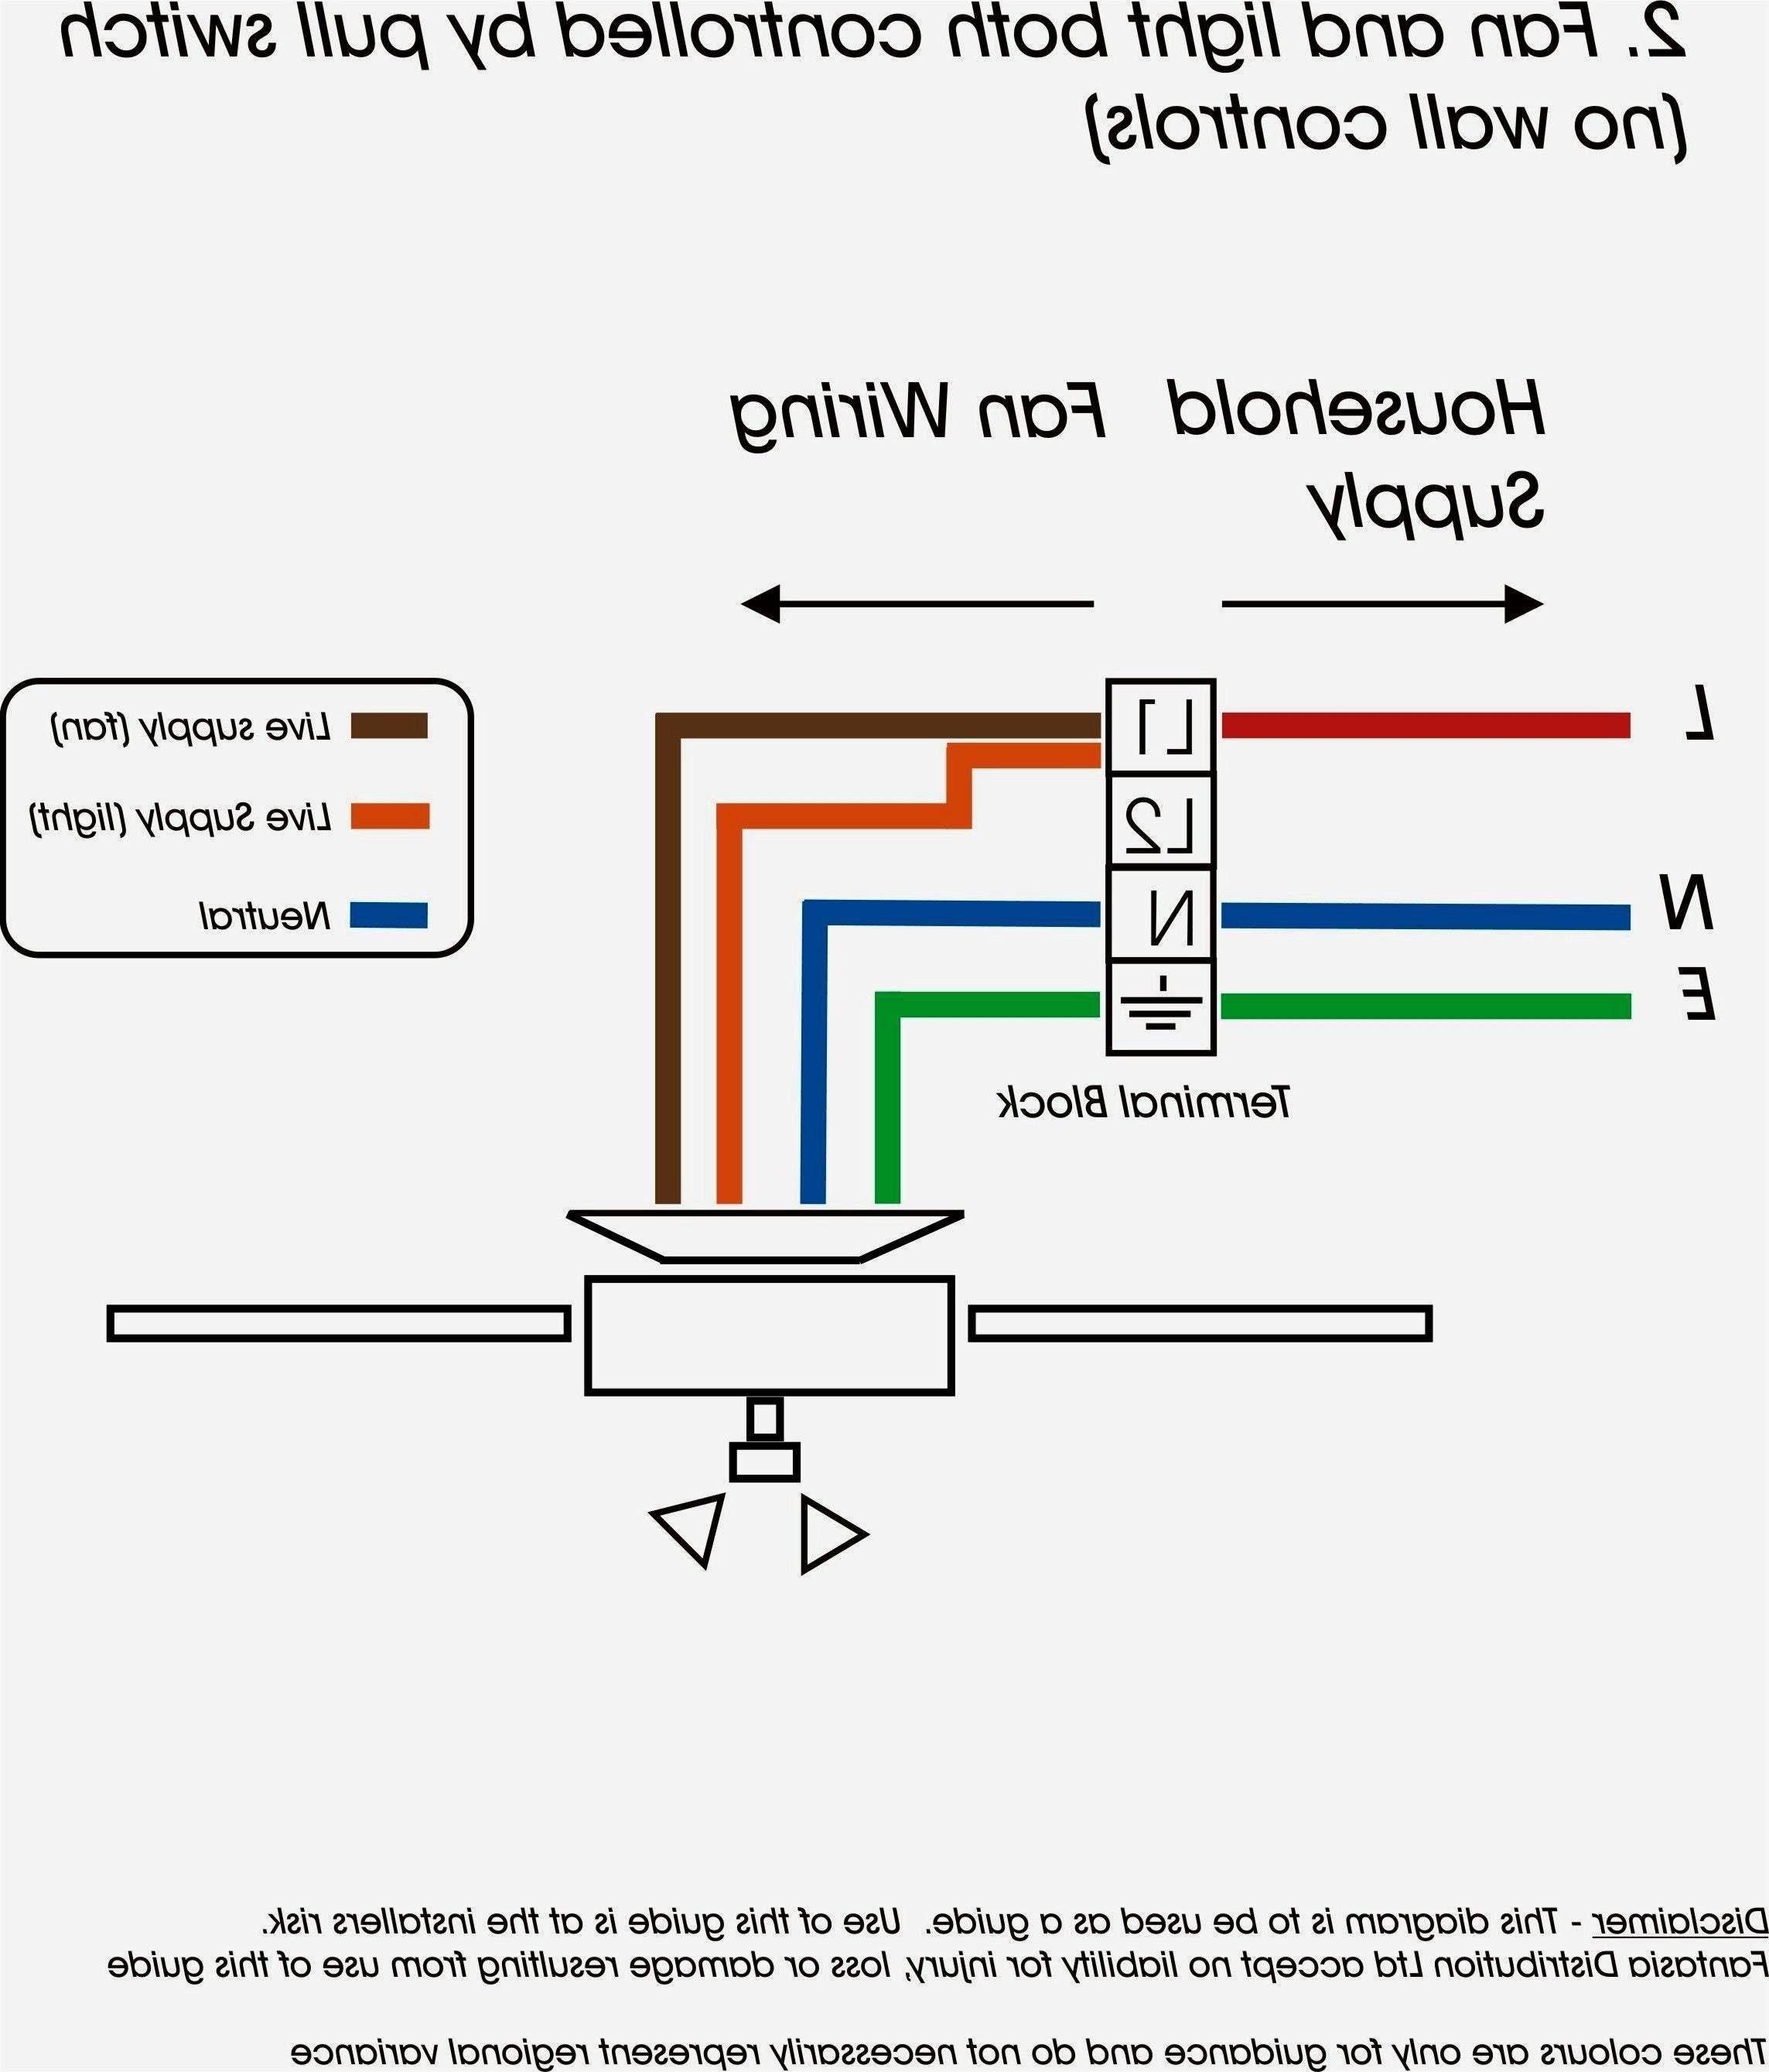 Wiring Diagram Book File 0140 Diagram Diagramtemplate Diagramsample Caravana De Lagrima Esquemas Electronicos Motor Dc